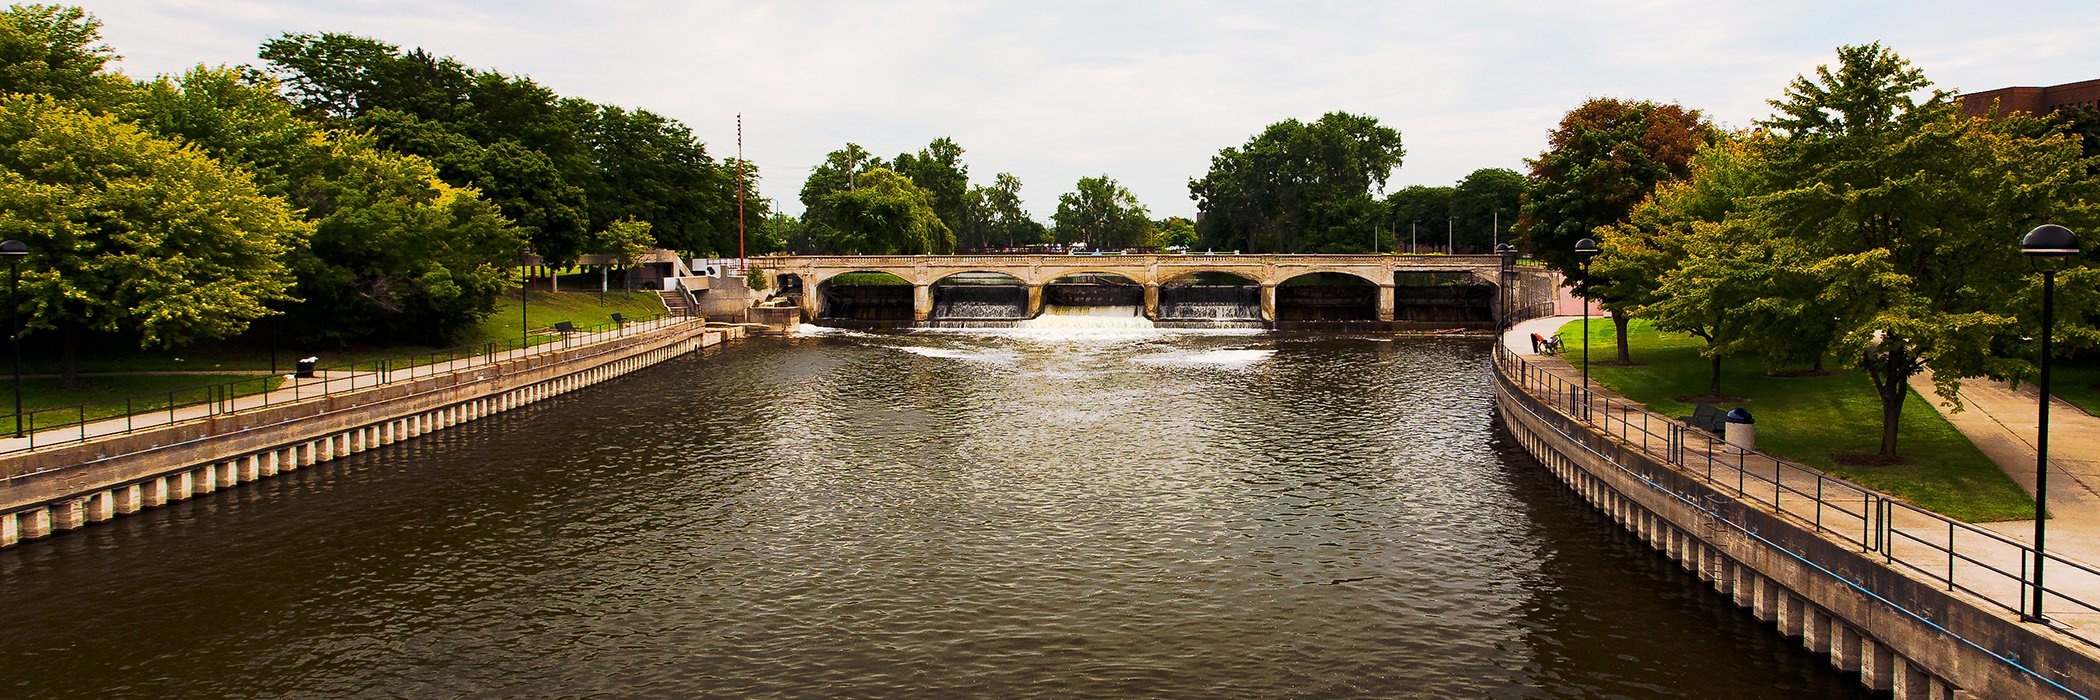 Flint-Water-Crisis-Justice-Header.jpg